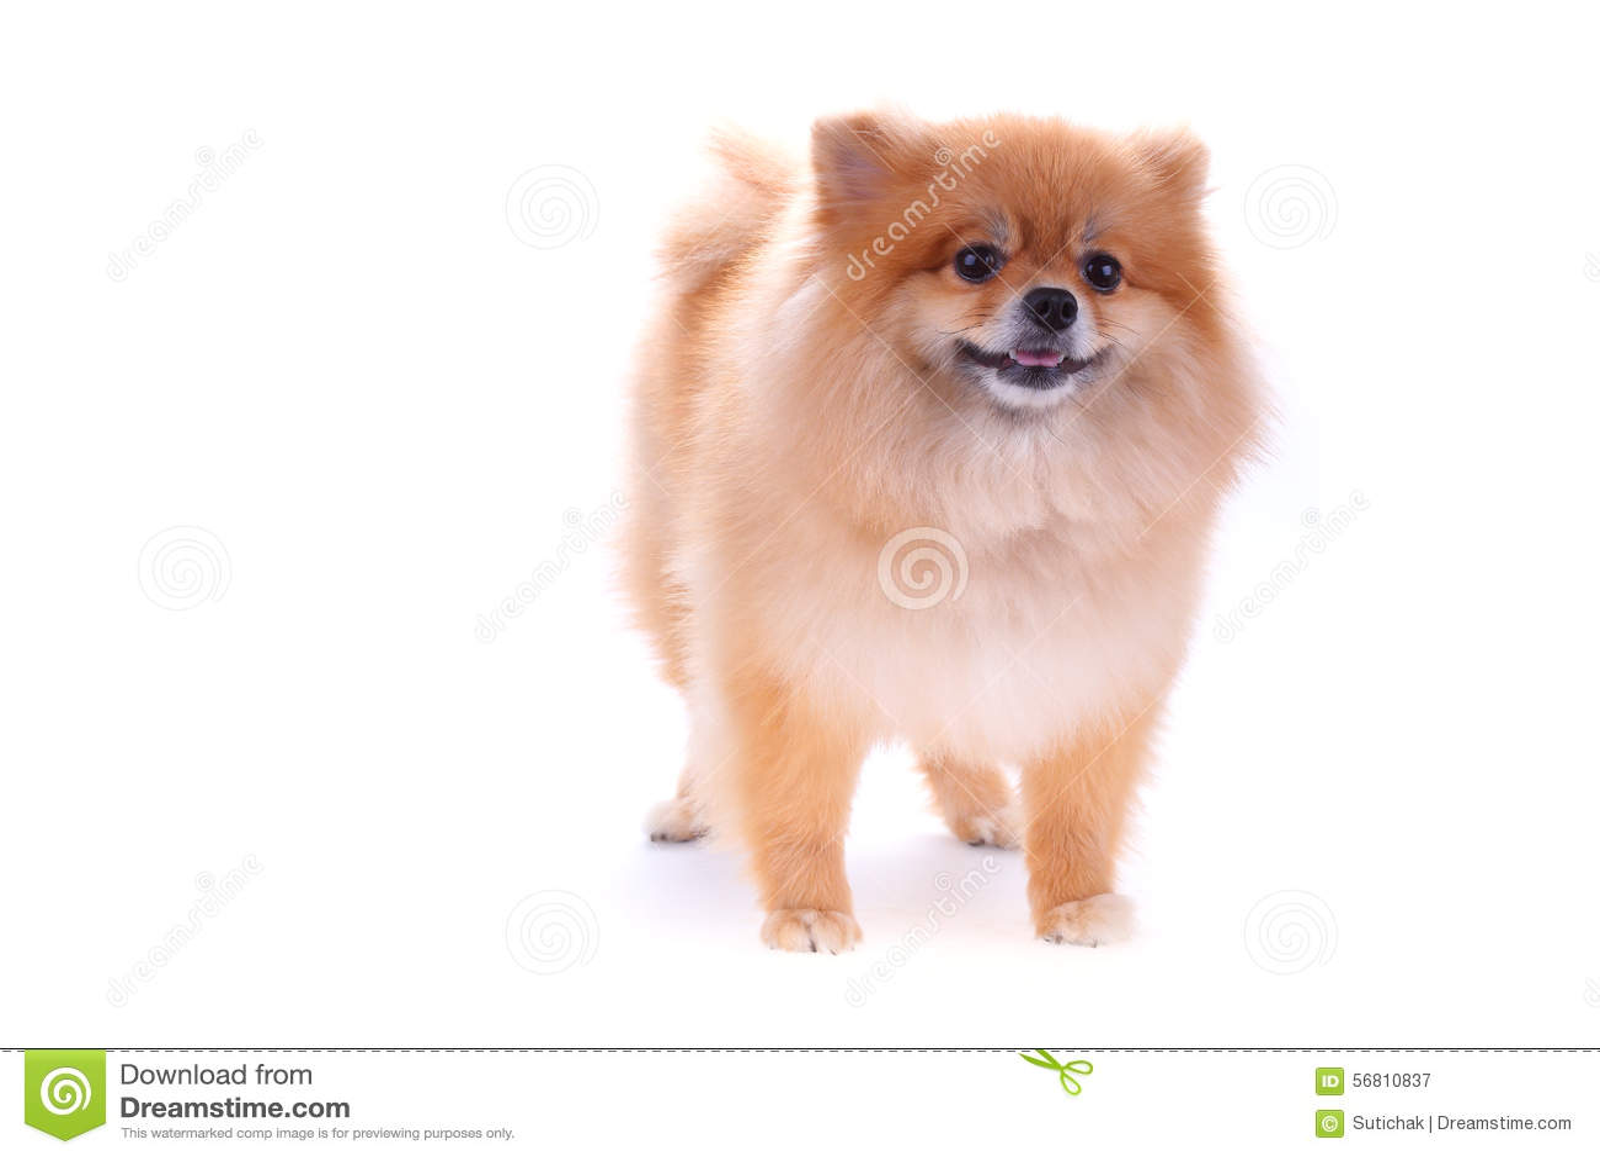 Brown Pomeranian Dog Stock Image Image Of Small Pretty 56810837